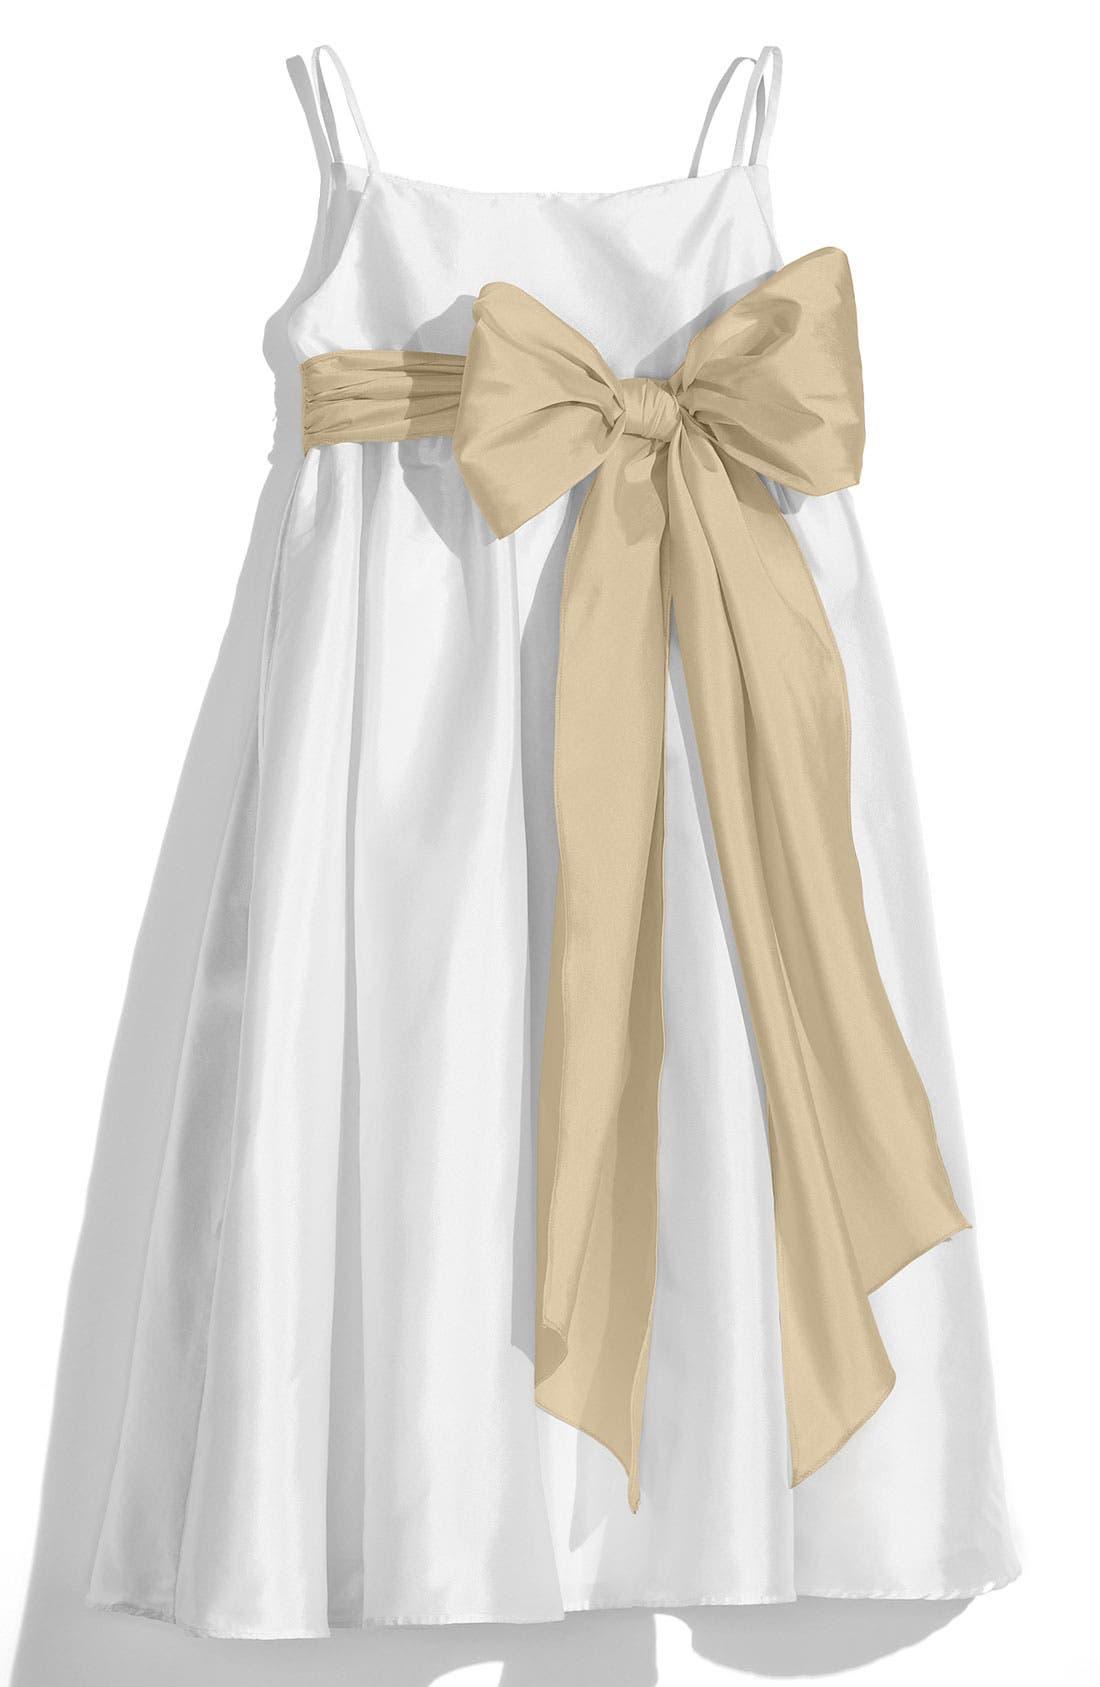 Us Angels White Sleeveless Empire Waist Taffeta Dress (Toddler, Little Girls & Big Girls)